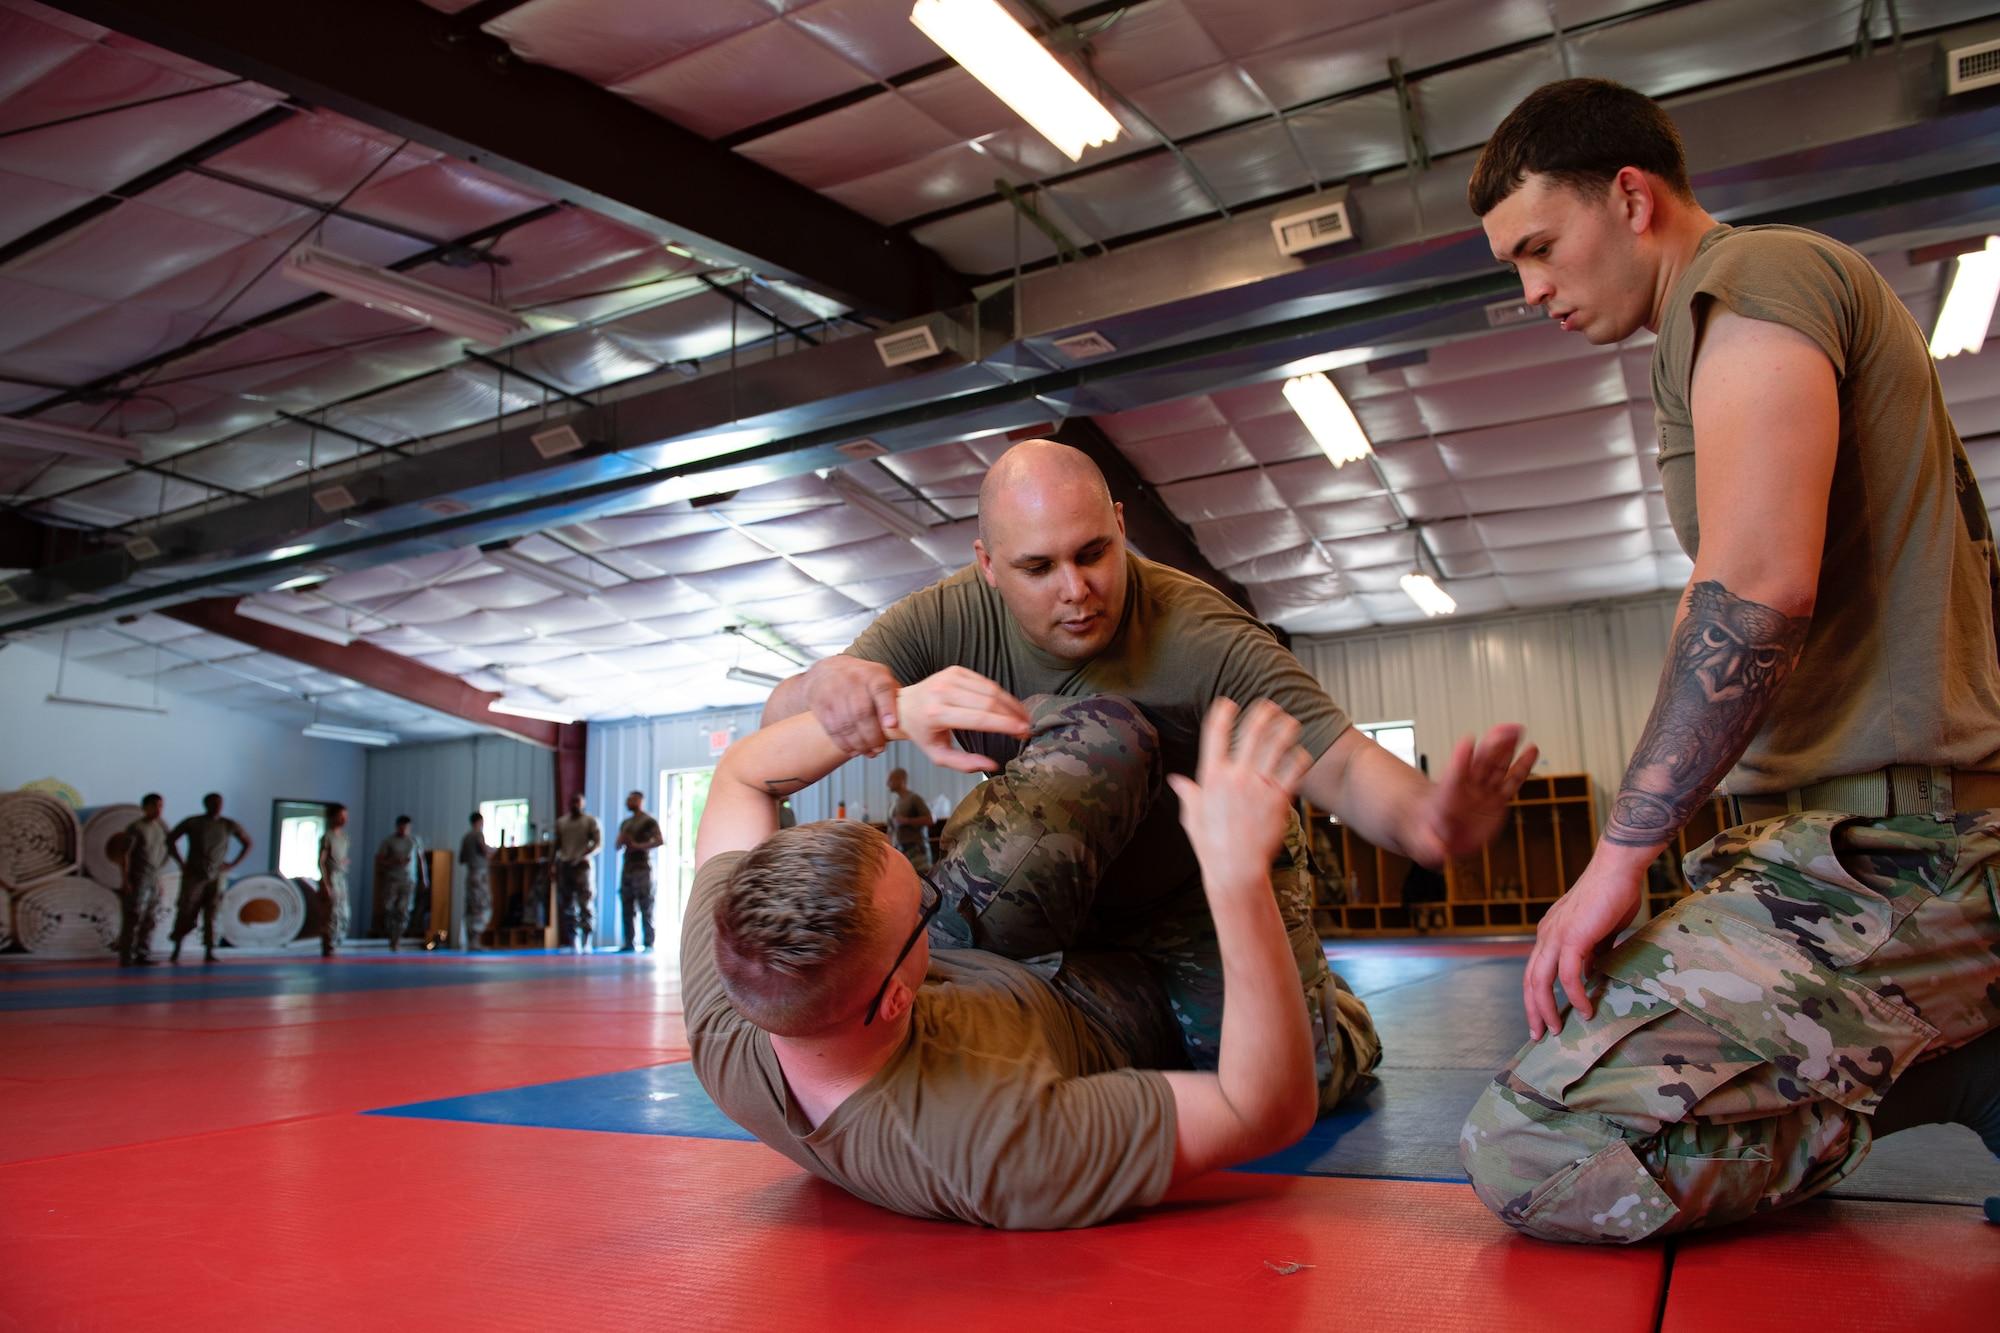 514th SFS combatives training